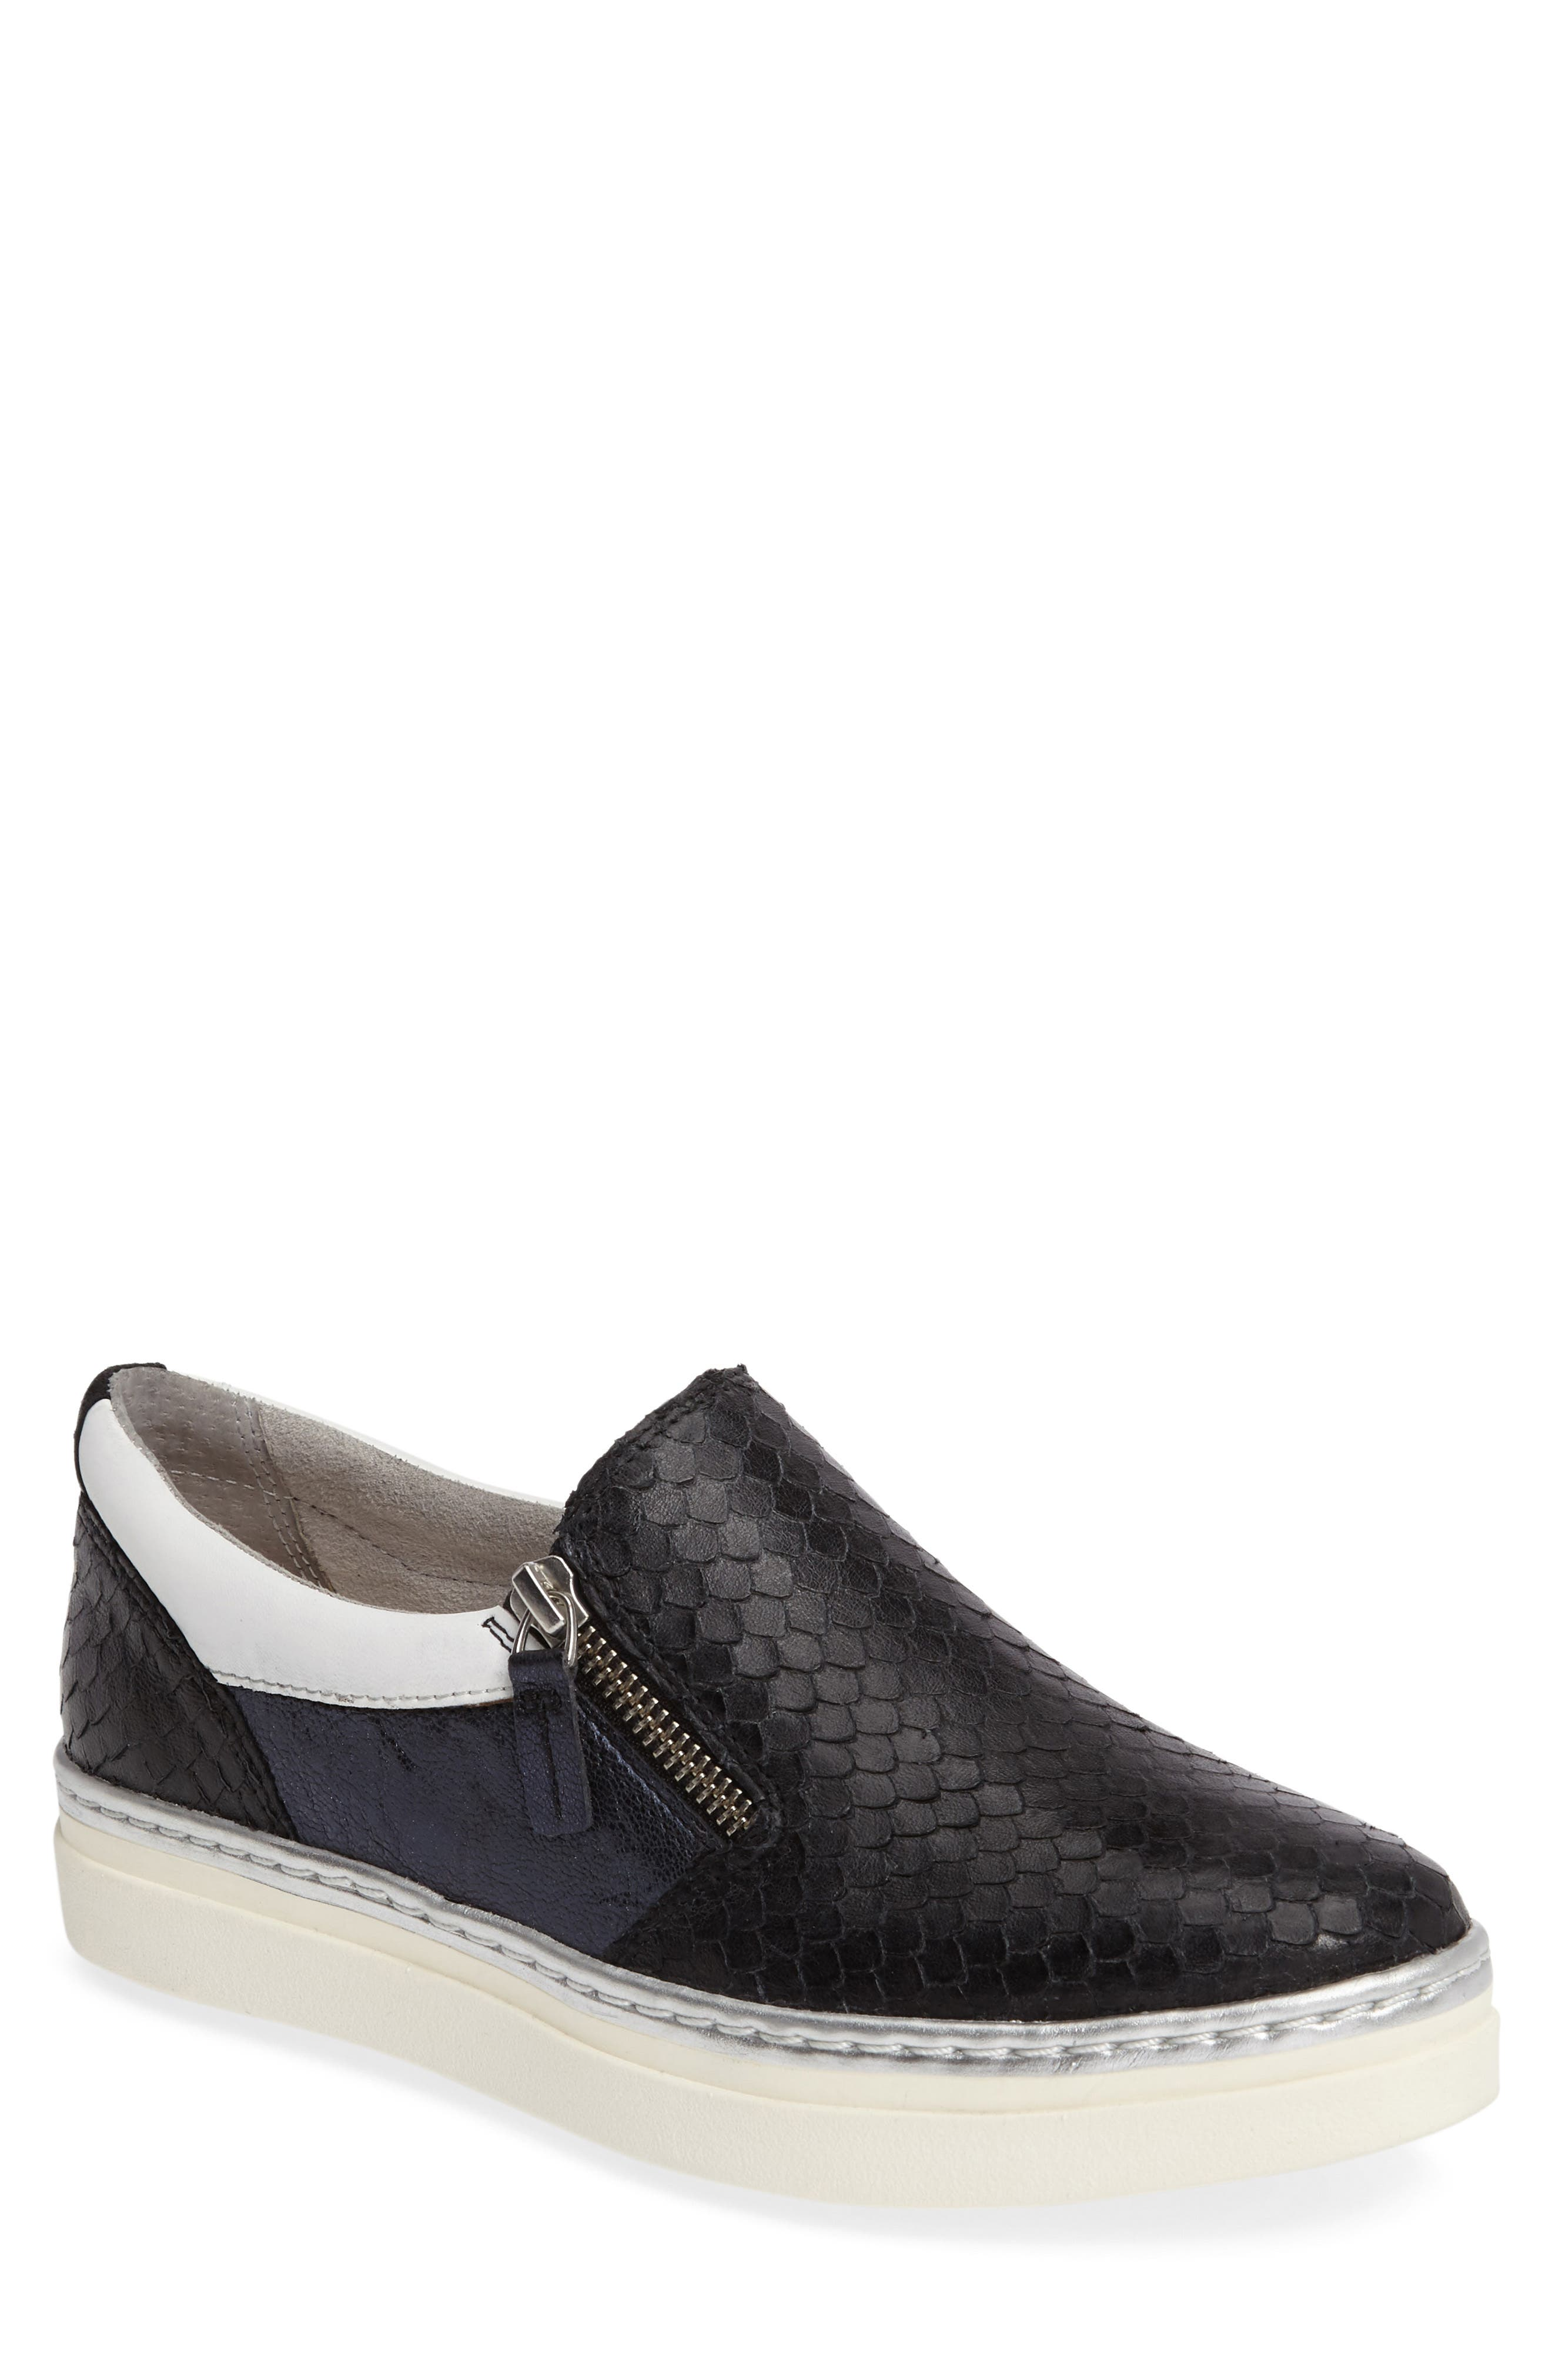 Tamaris Mila Slip-On Sneaker (Women)